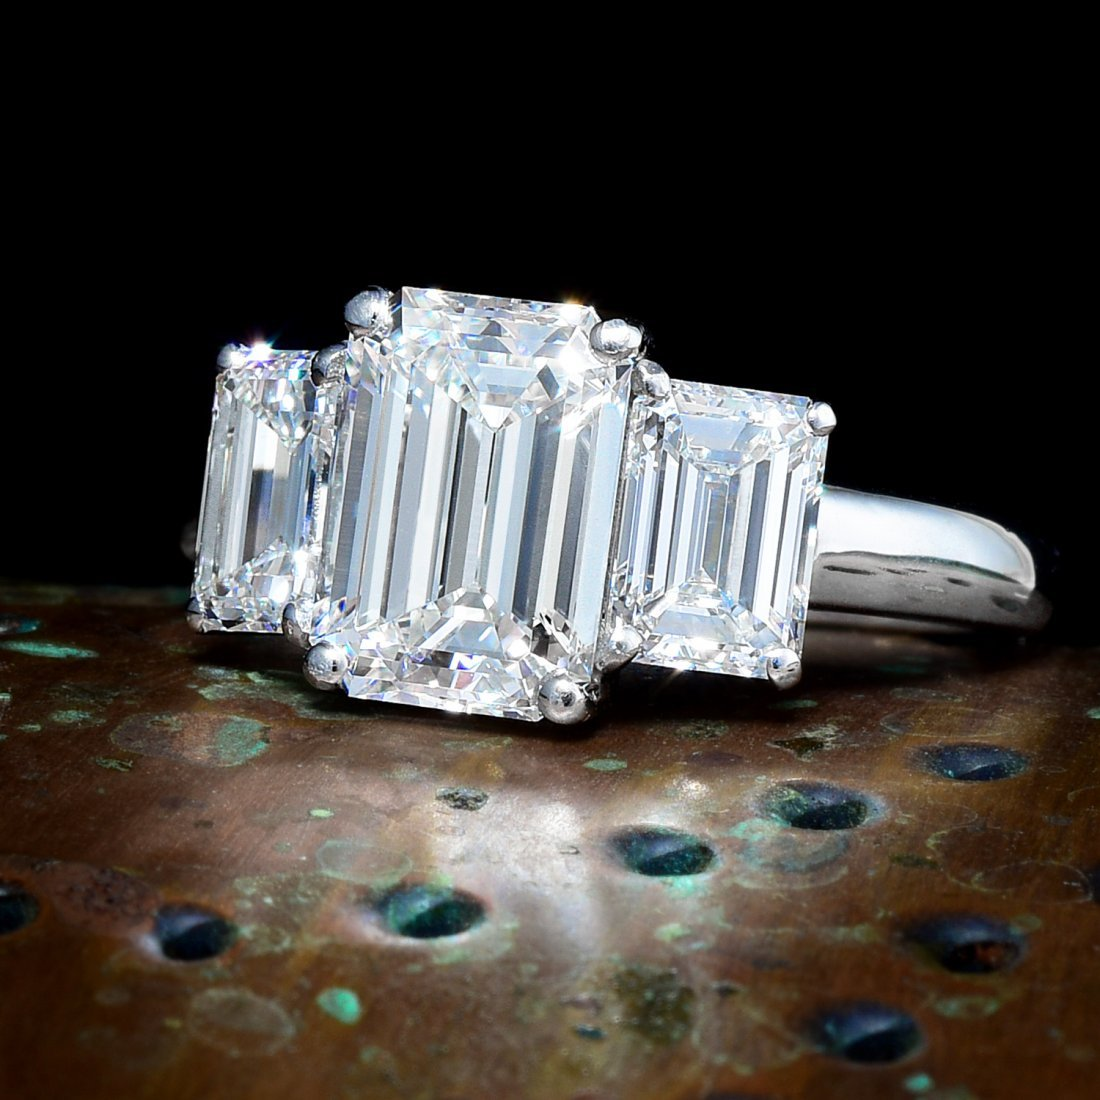 A 2.07-Carat Emerald-Cut Diamond Ring